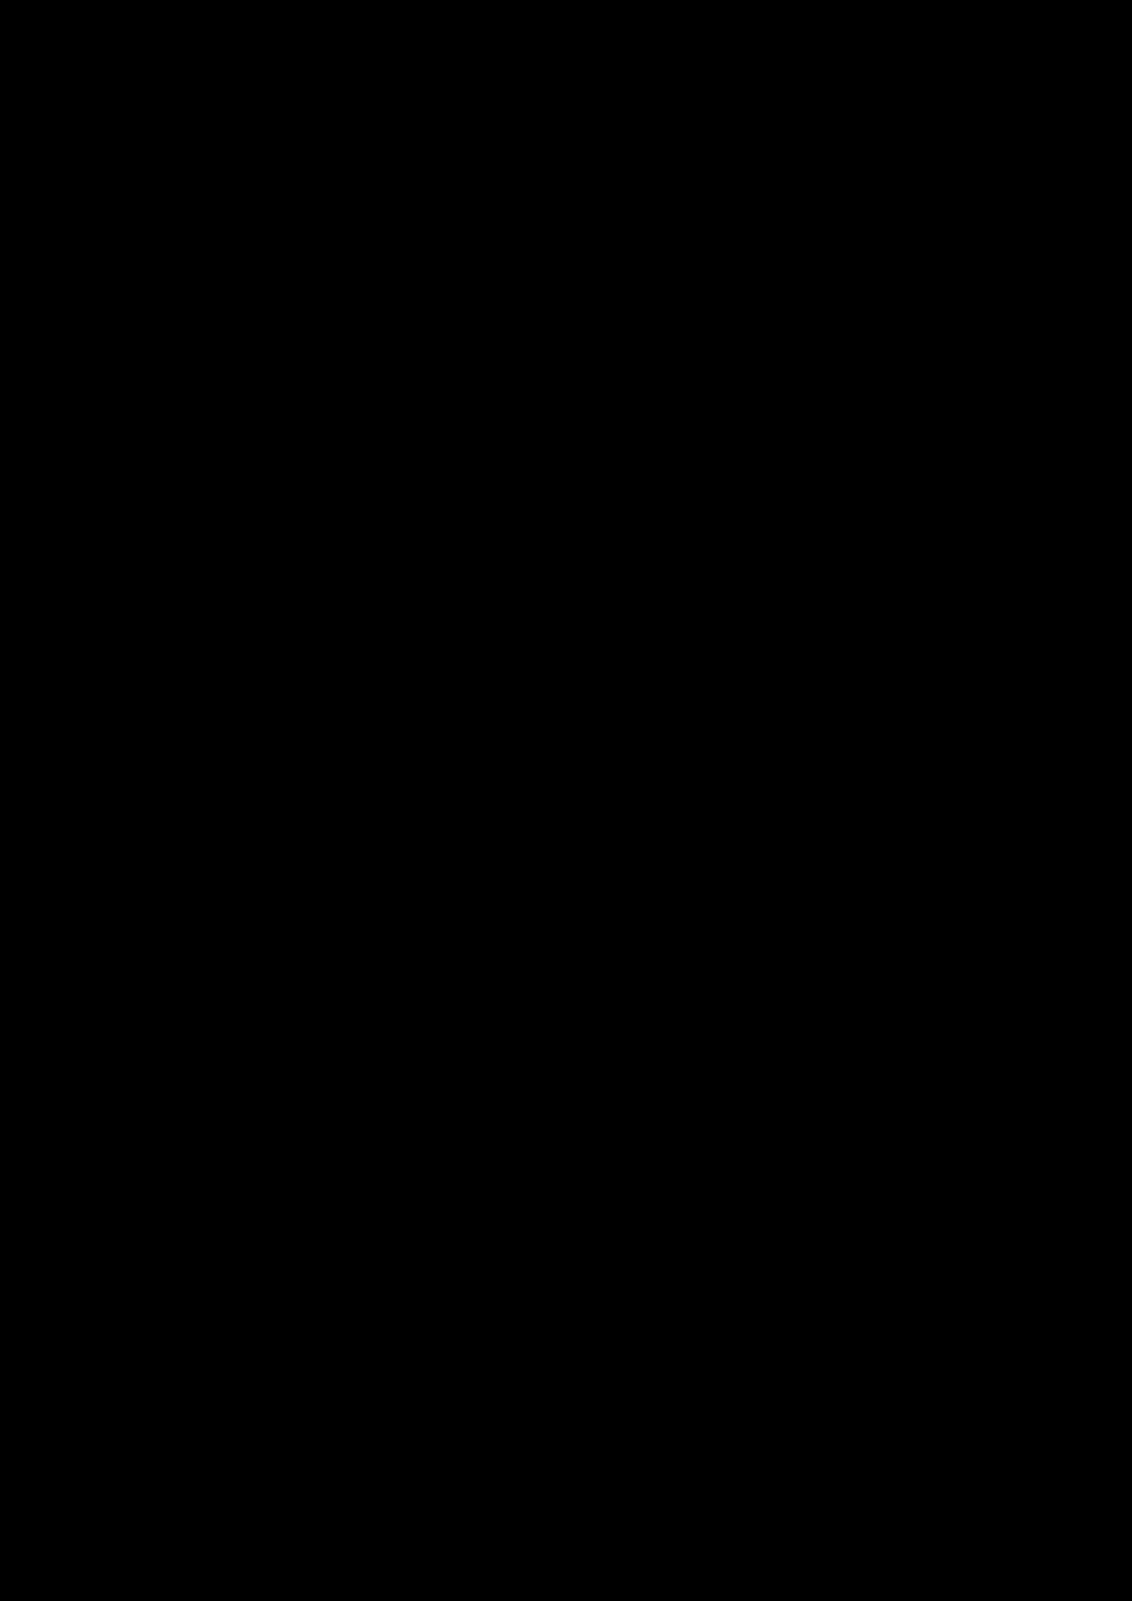 Belyiy sokol slide, Image 119